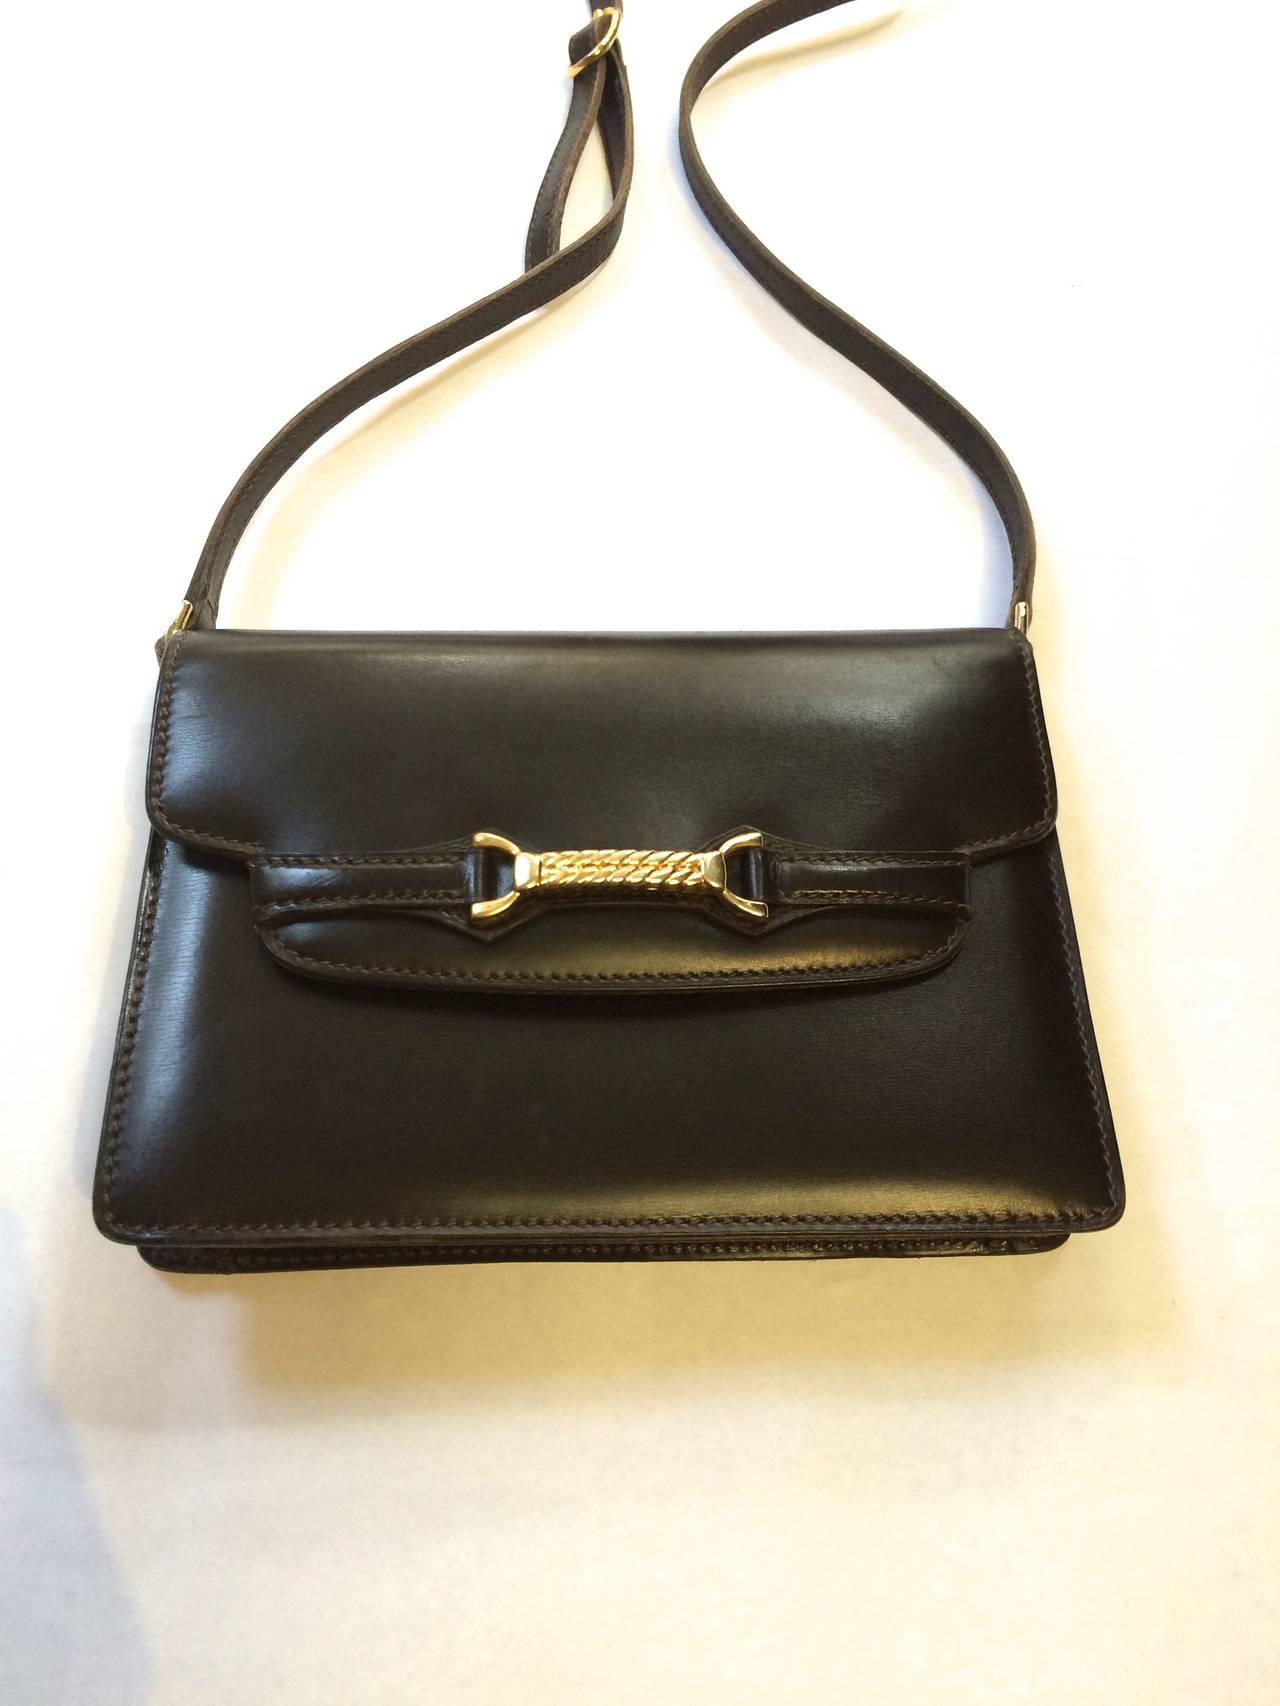 Charles Jourdan 70s Brown Leather Shoulder / Clutch Handbag lSWHnEUGC